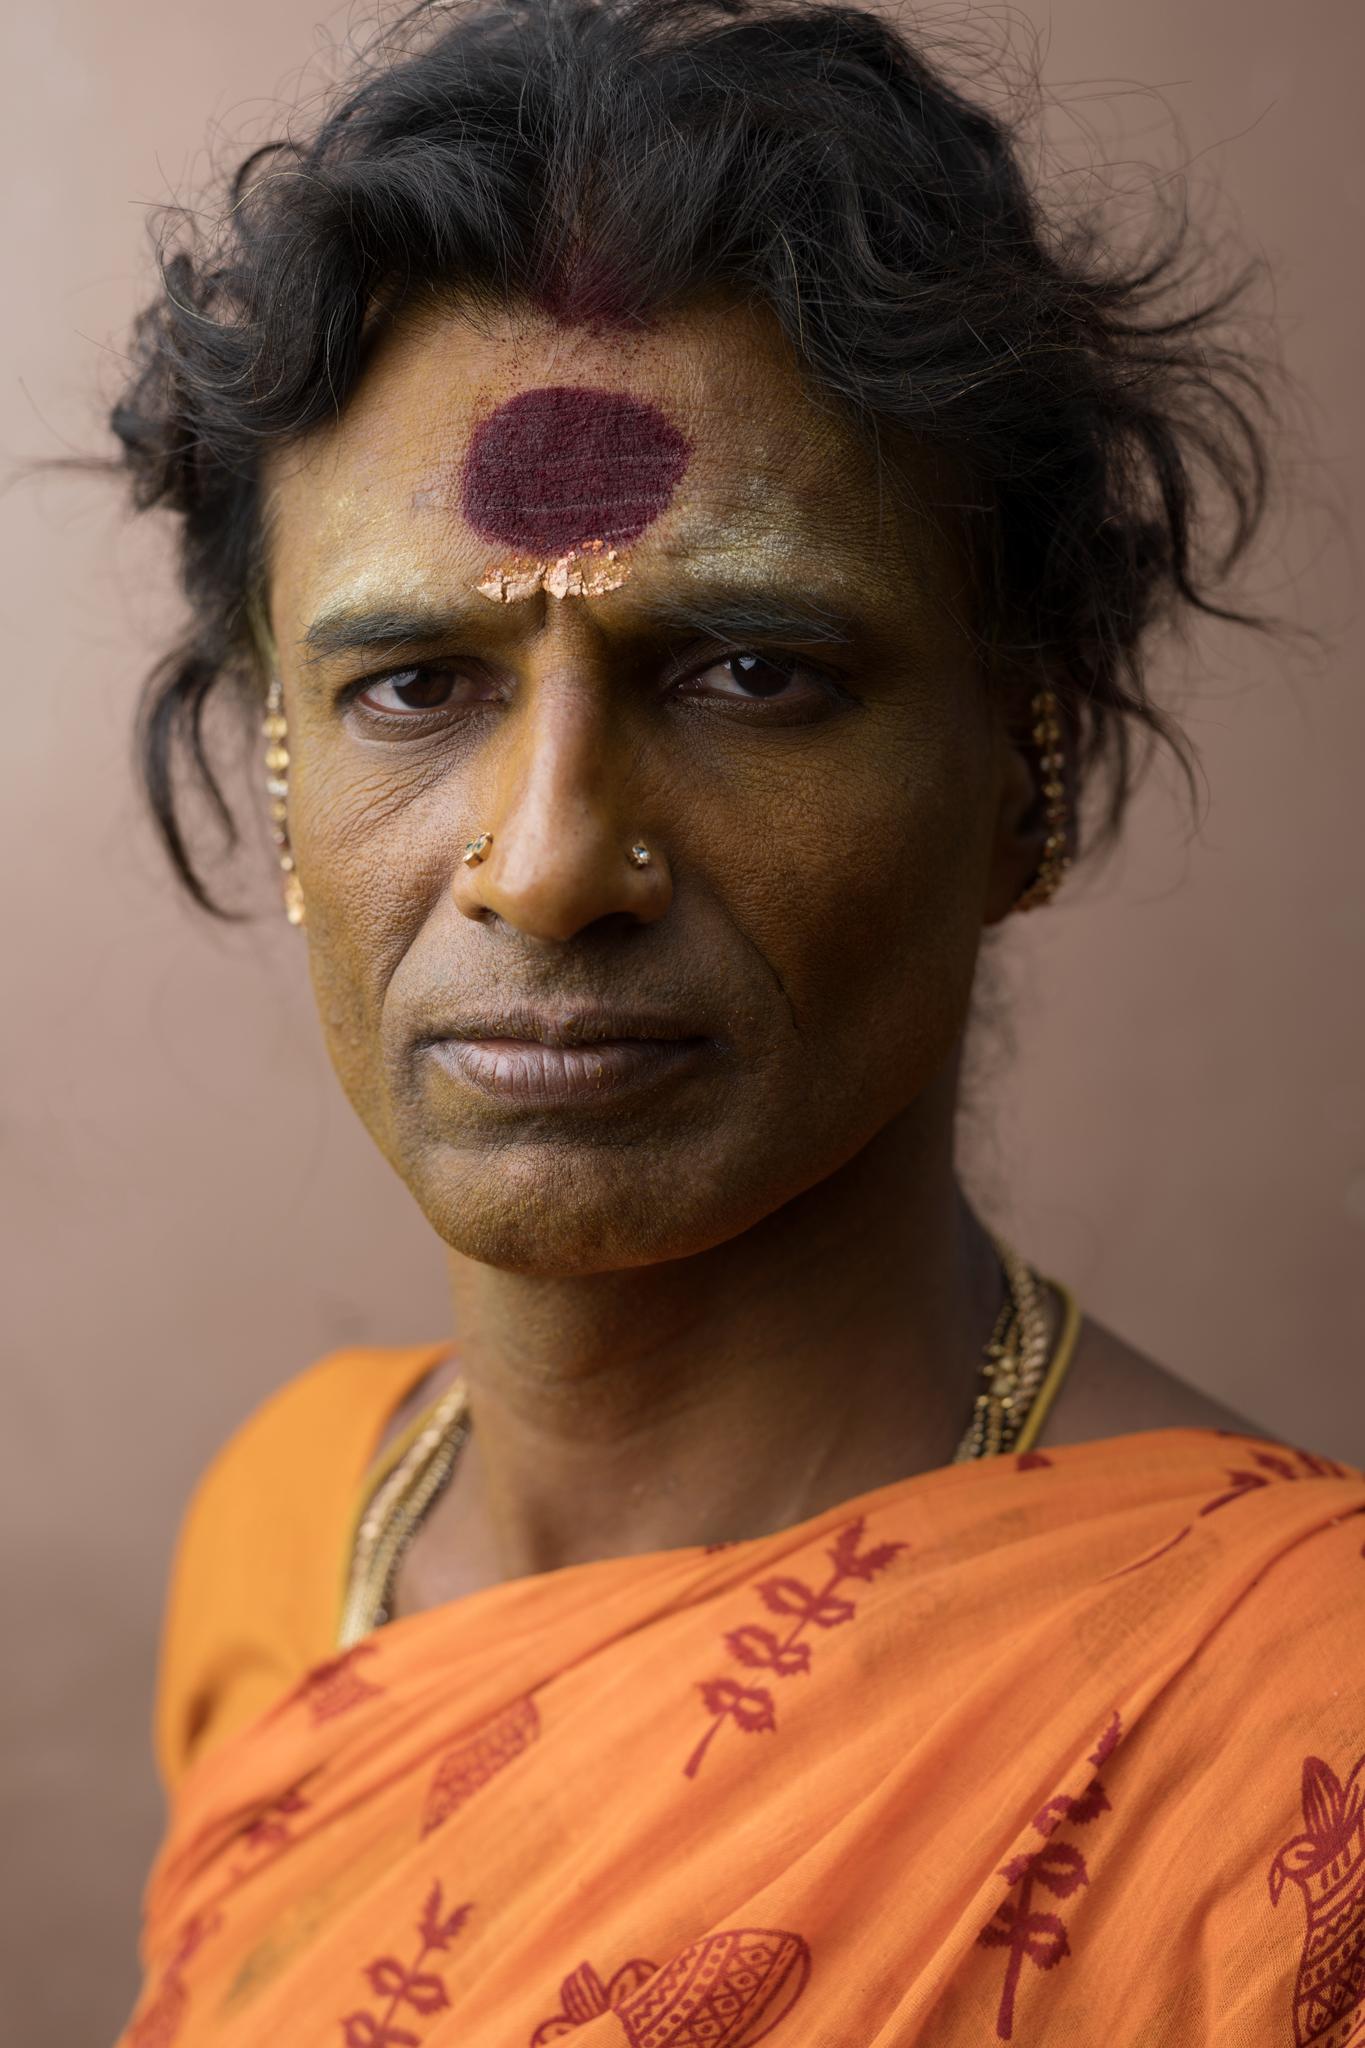 Varanasi_portrait_travel_photography_Manchester_Adventure_Photographer_Jan_Bella5.jpg